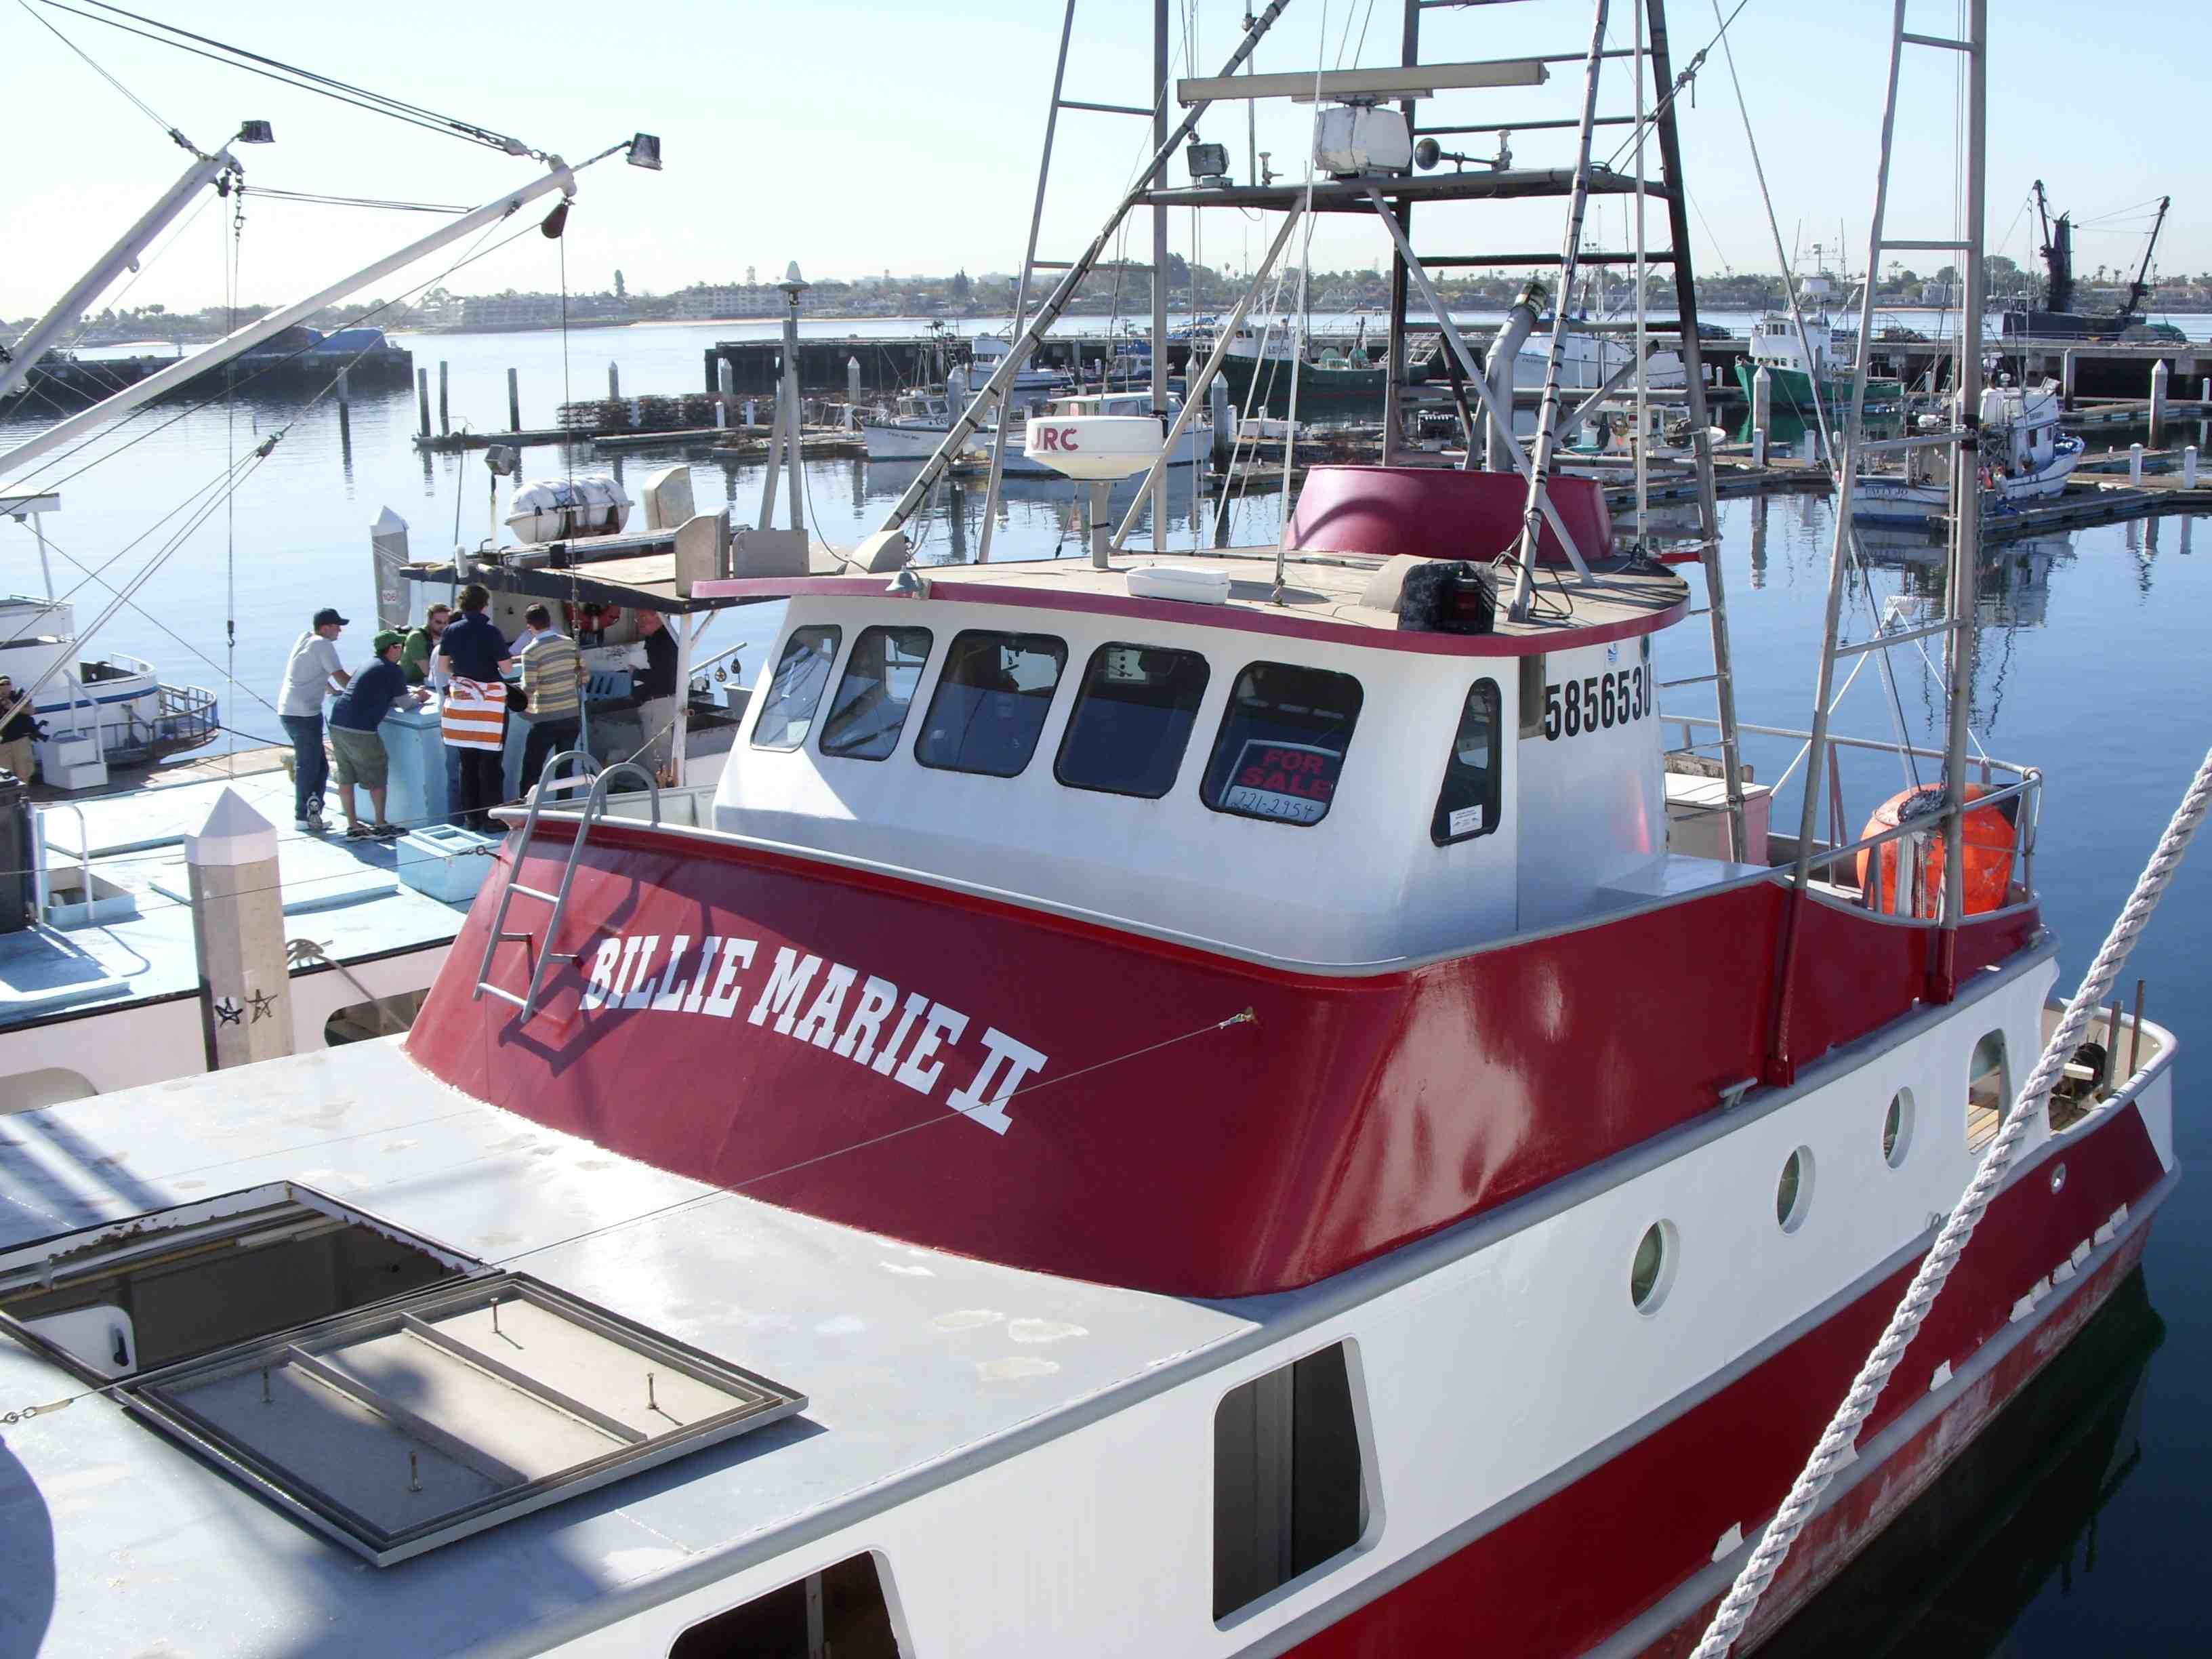 albacore-tuna-fishing-vessel-san-diego1